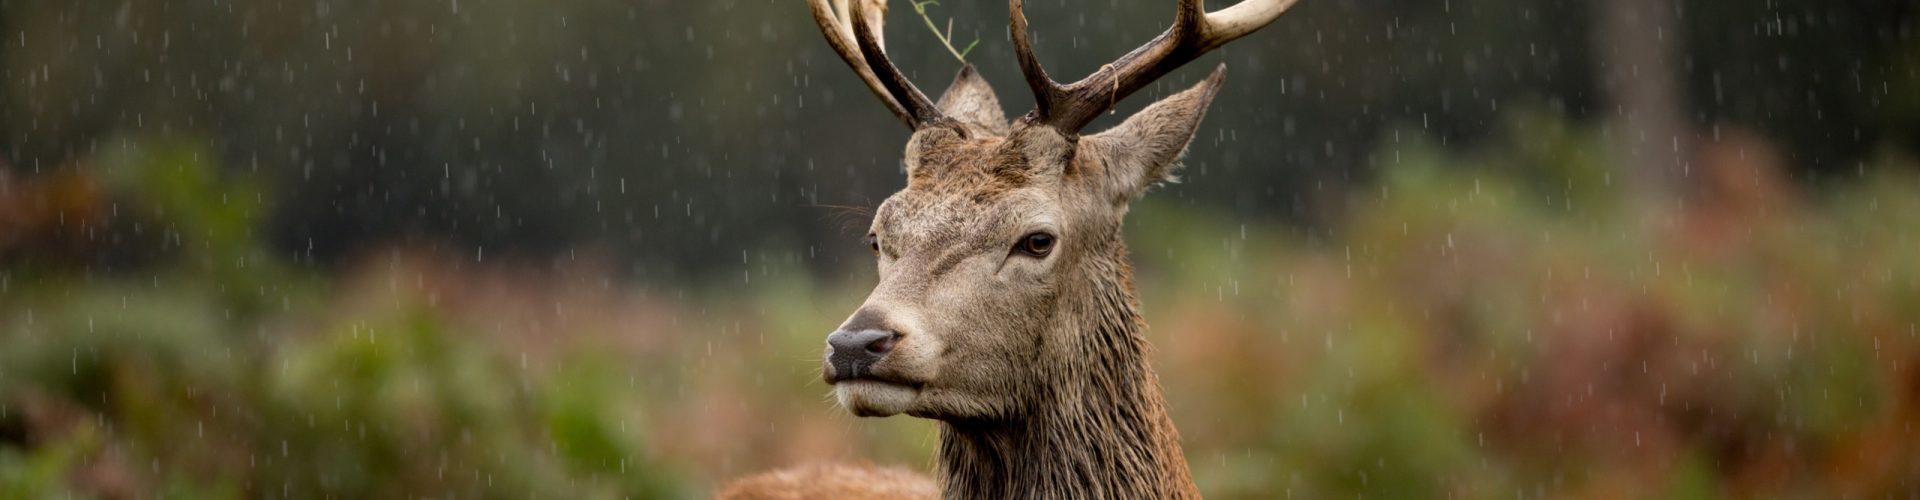 A Scottish stag standing in braken in the rain